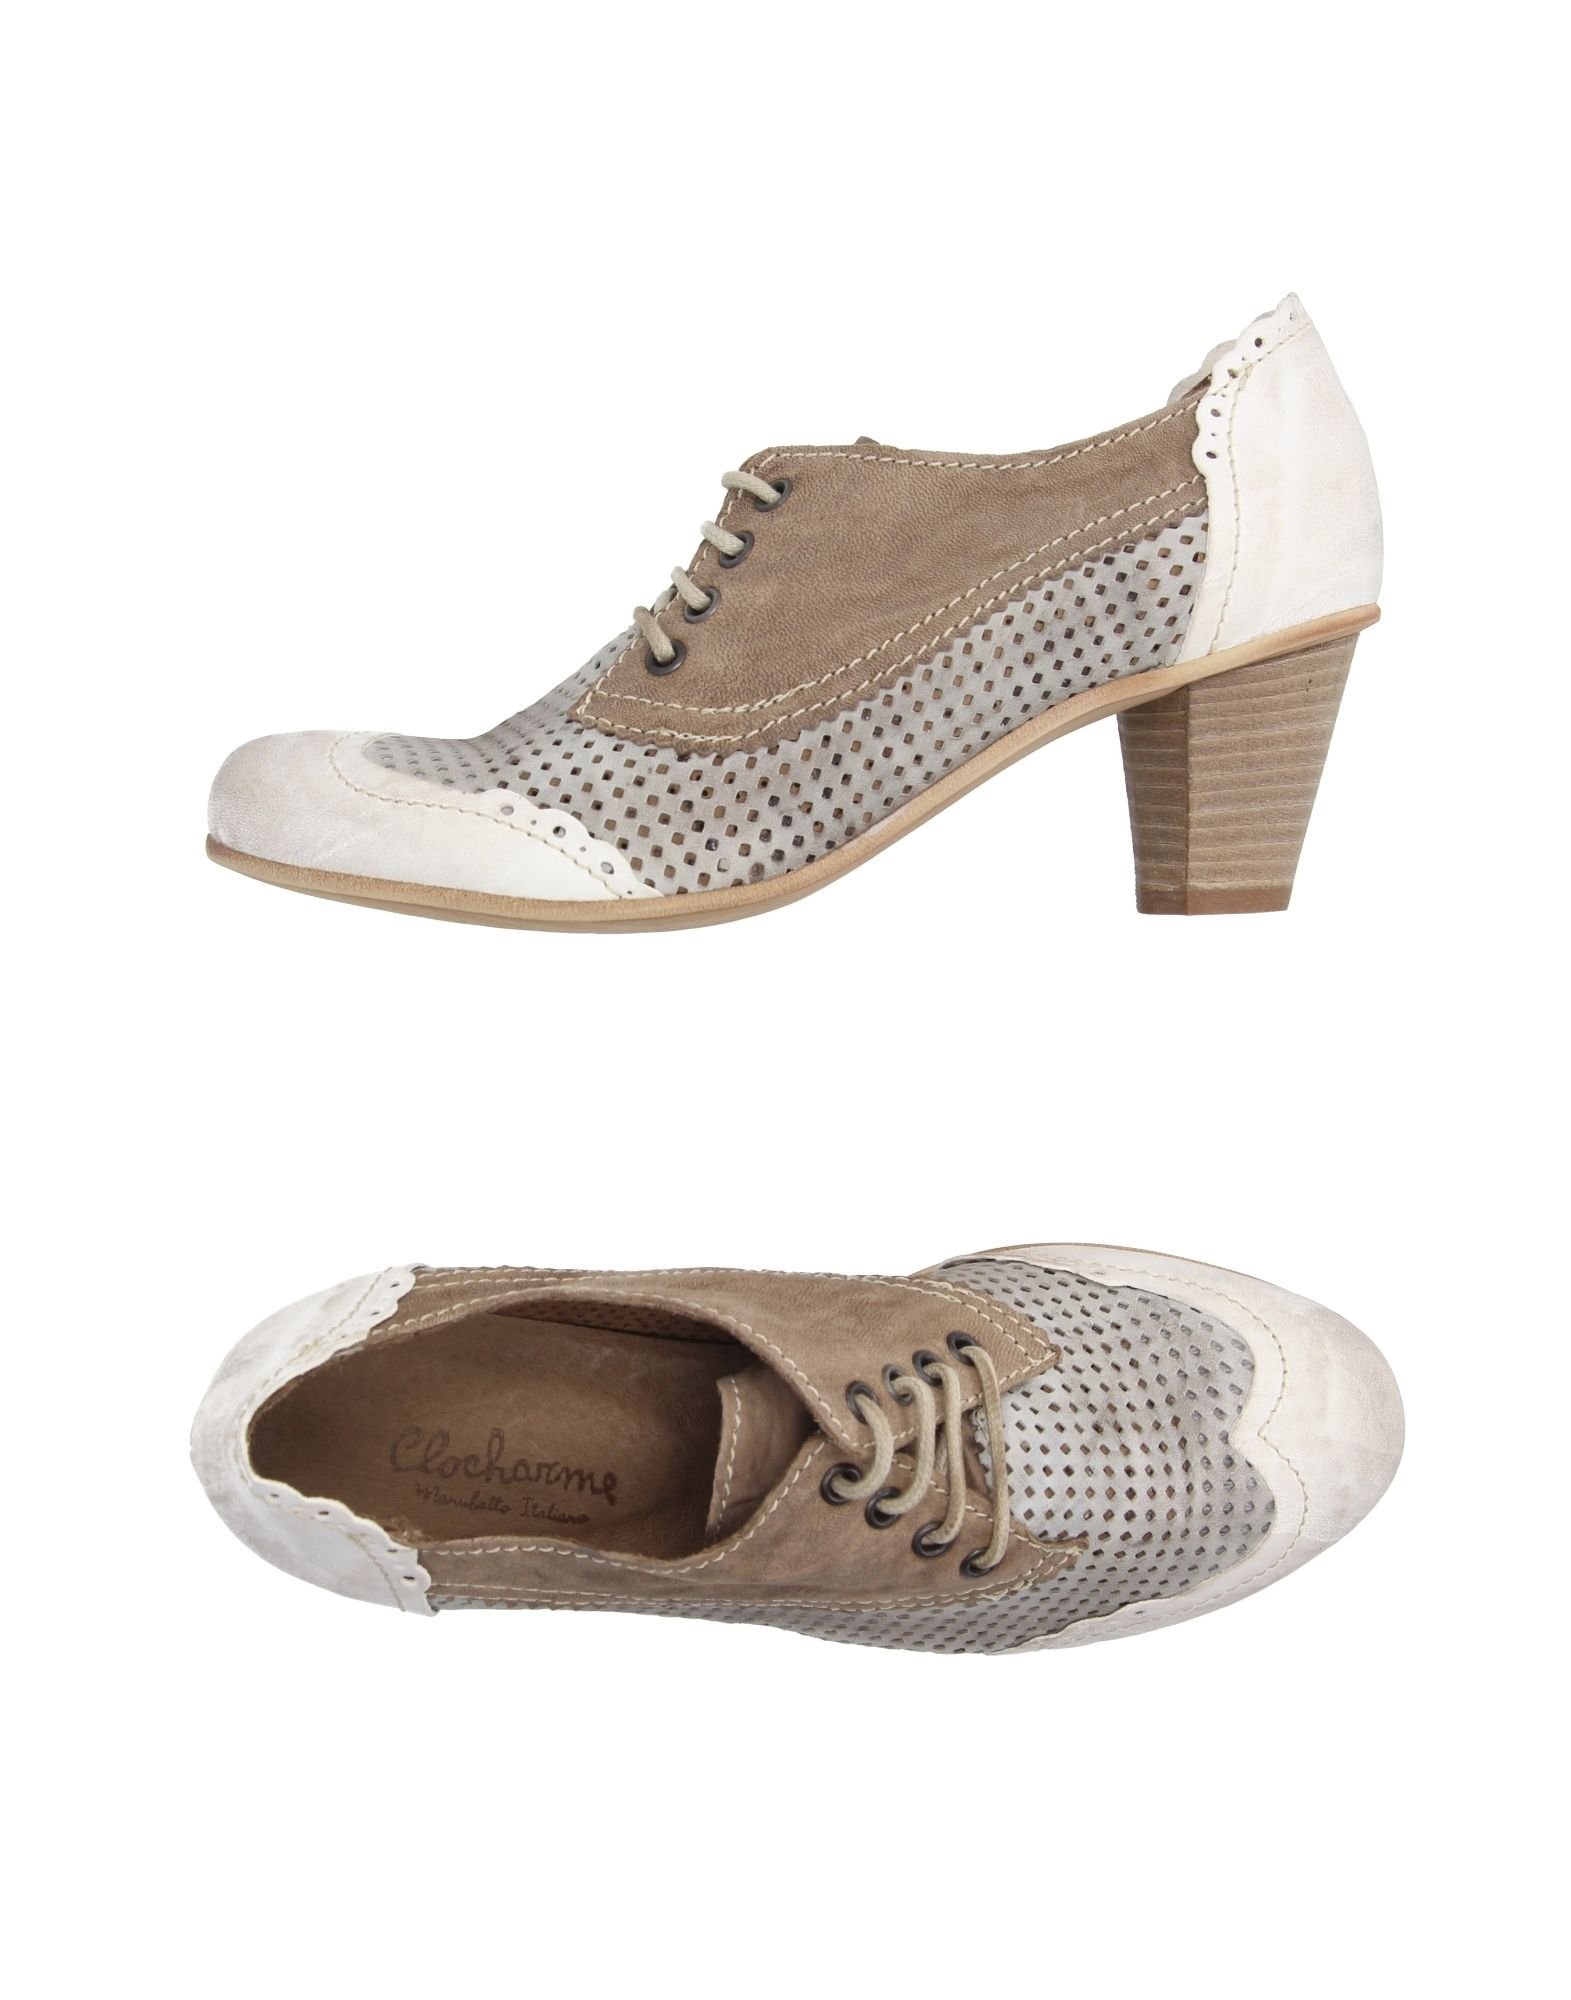 Clocharme Schnürschuhe Damen  44955640NJ 44955640NJ 44955640NJ Gute Qualität beliebte Schuhe f0a601